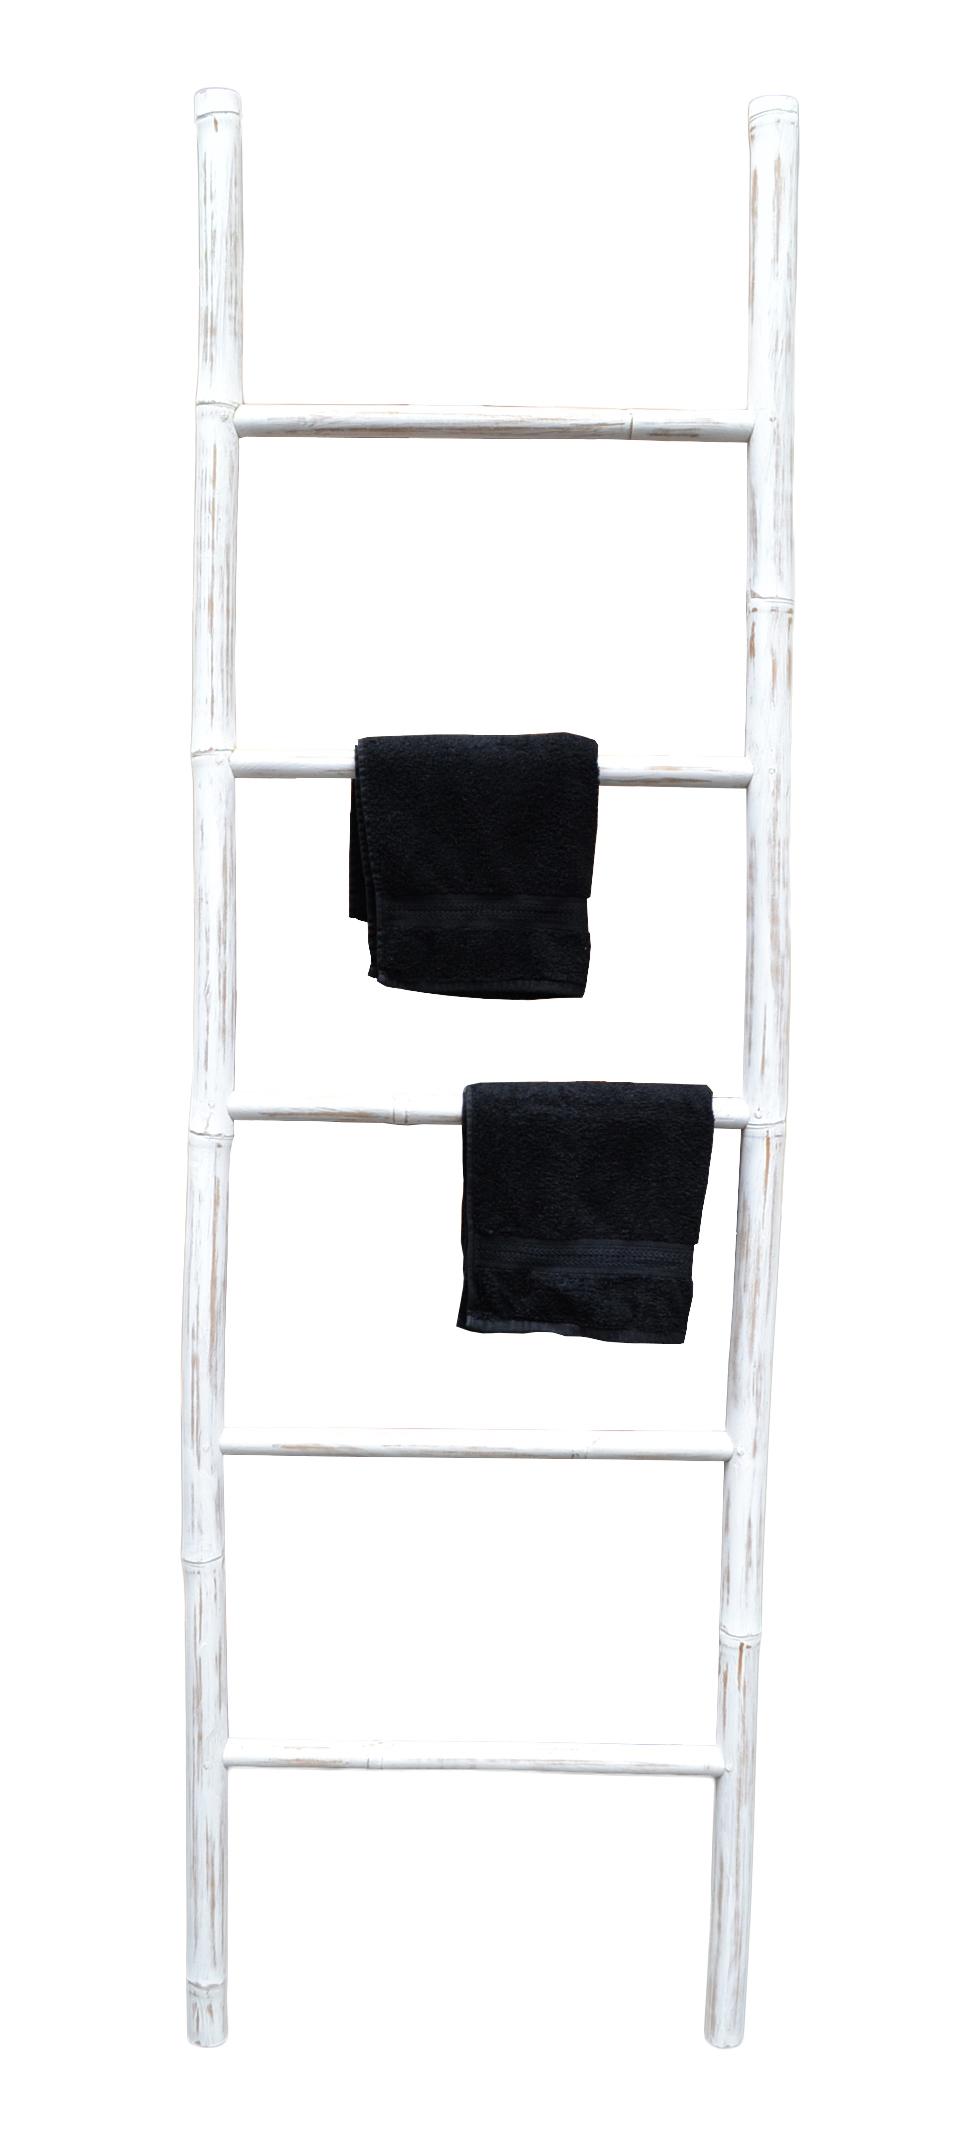 xl bambus handtuchhalter bambusleiter handtuchhalter. Black Bedroom Furniture Sets. Home Design Ideas